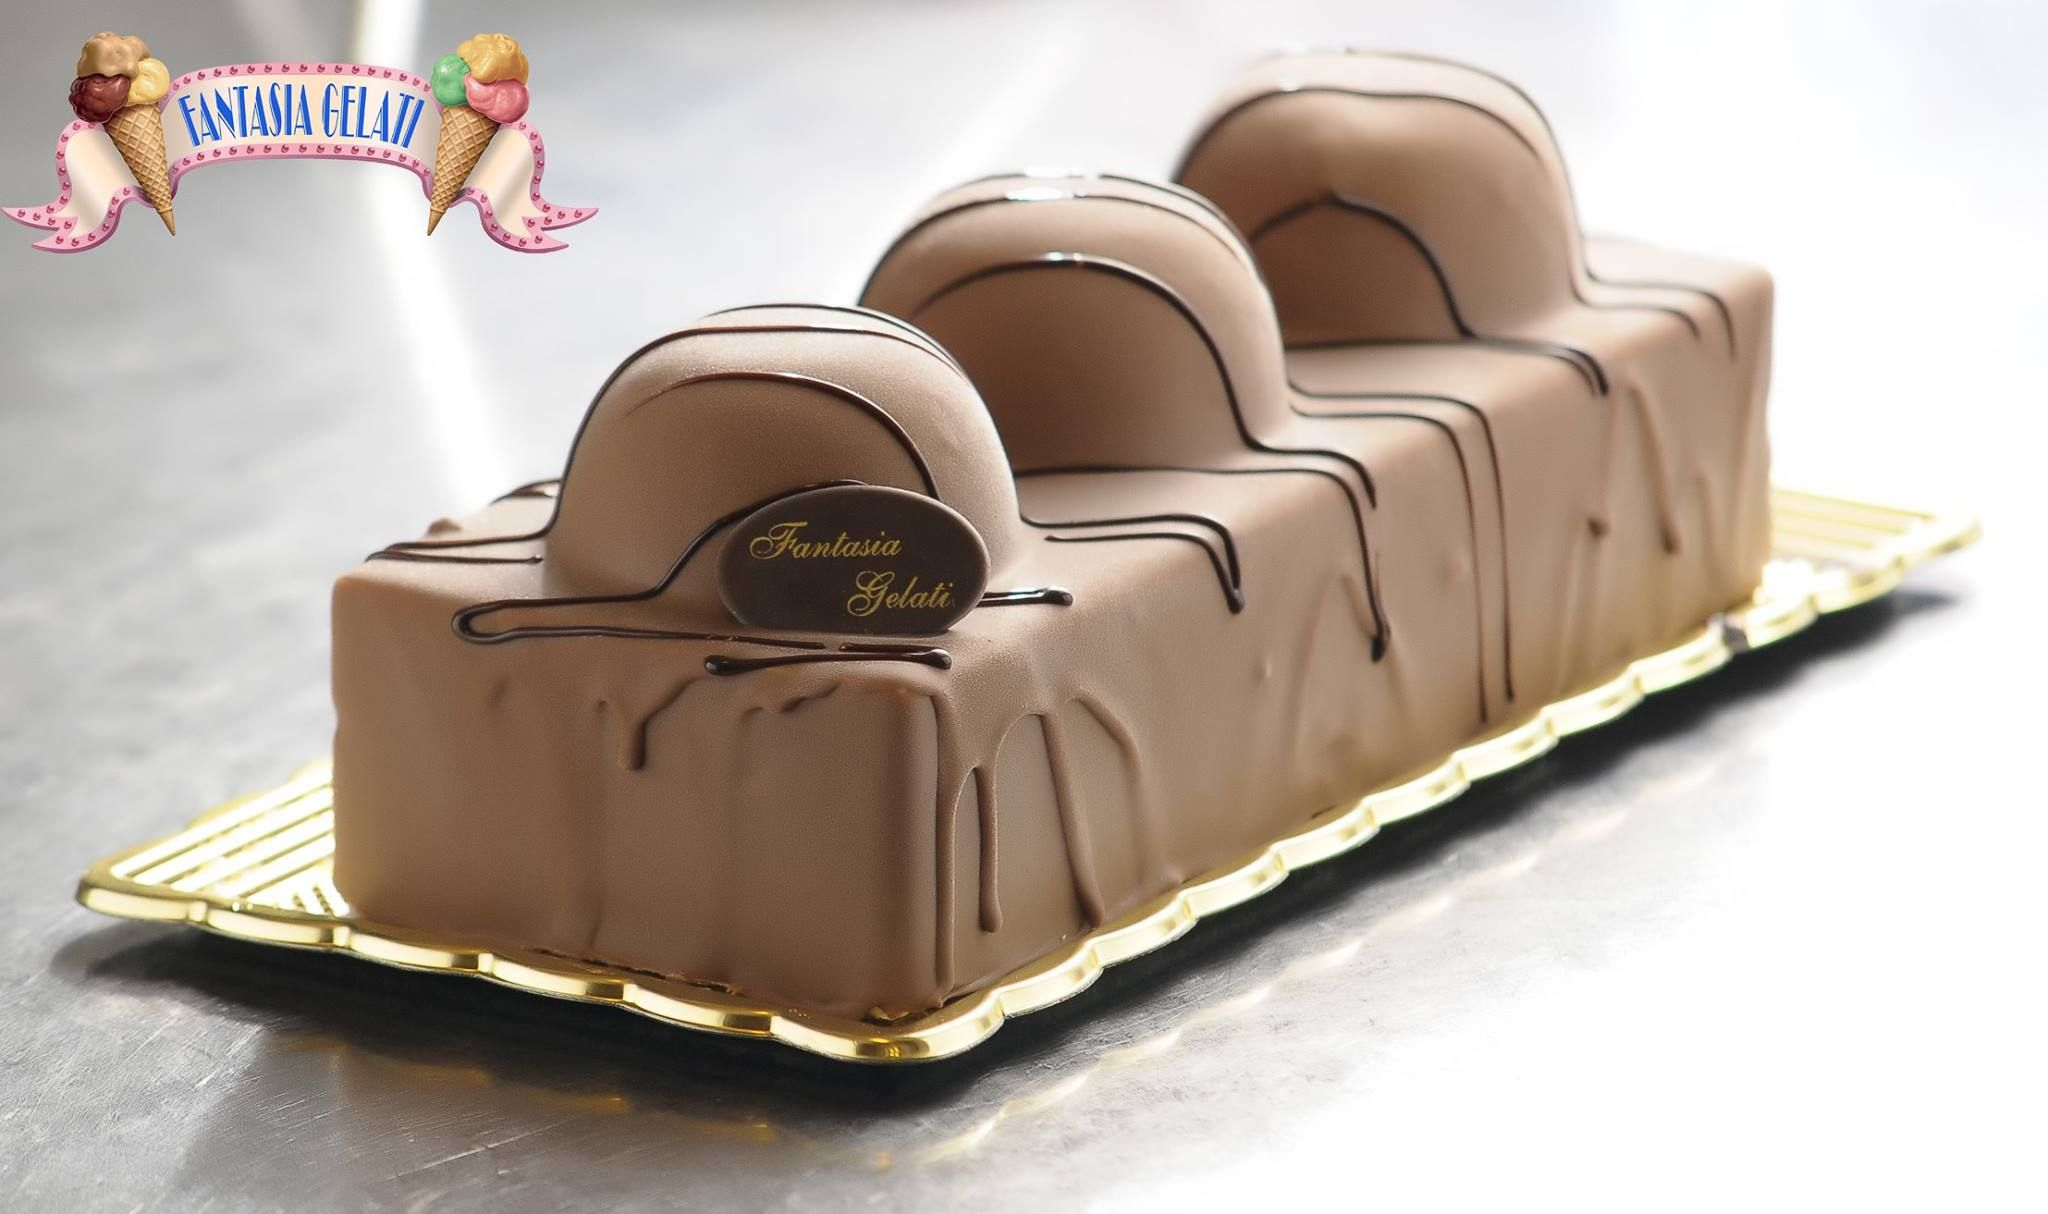 Torta Duplo Di Fantasia Gelati Napoli Tortecakes Cake Torte